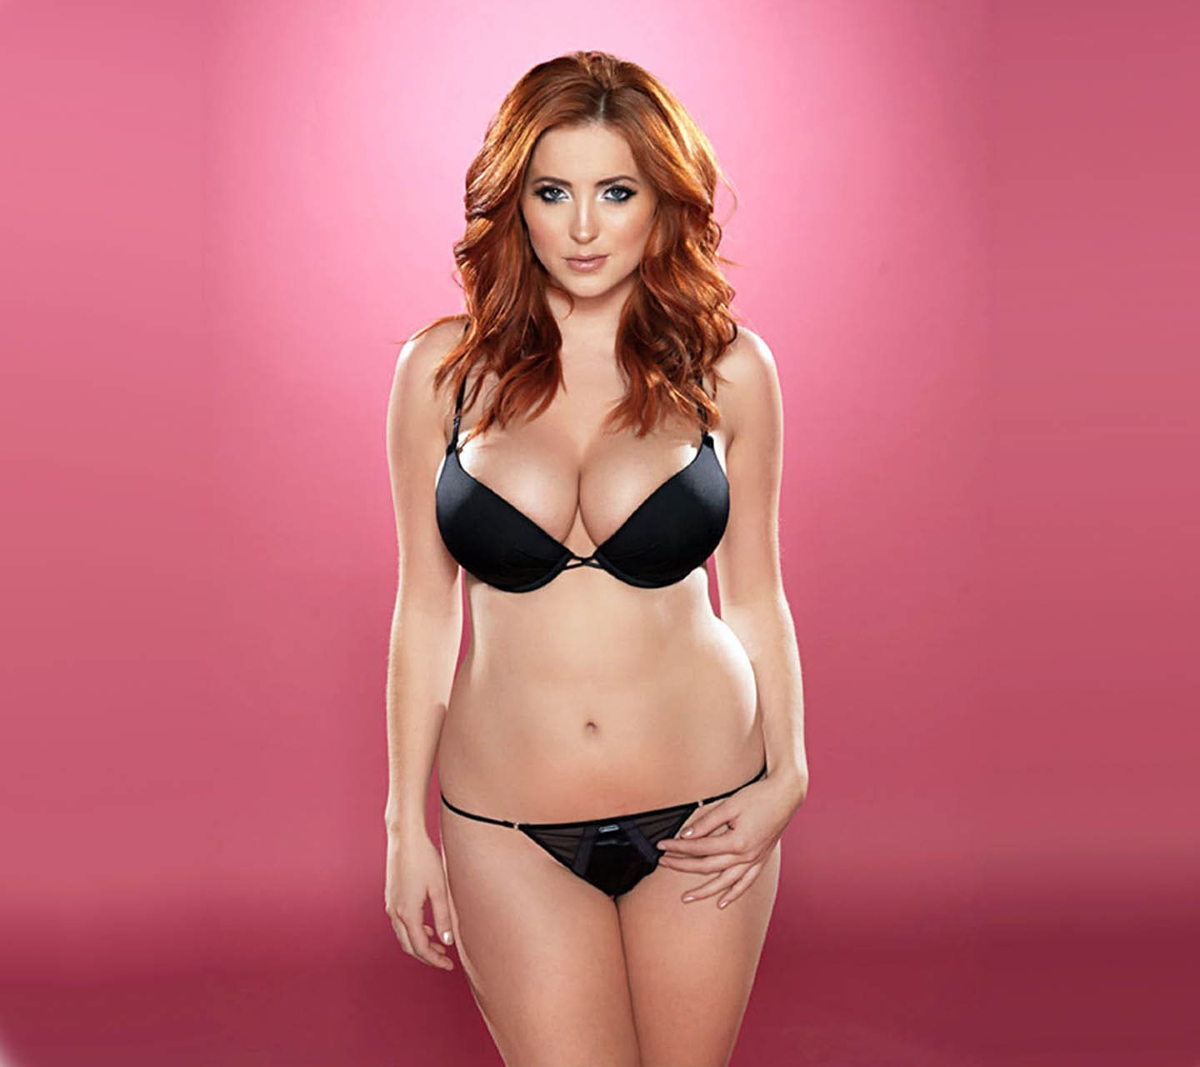 Redhead girl. Beauty with big tits in a bikini